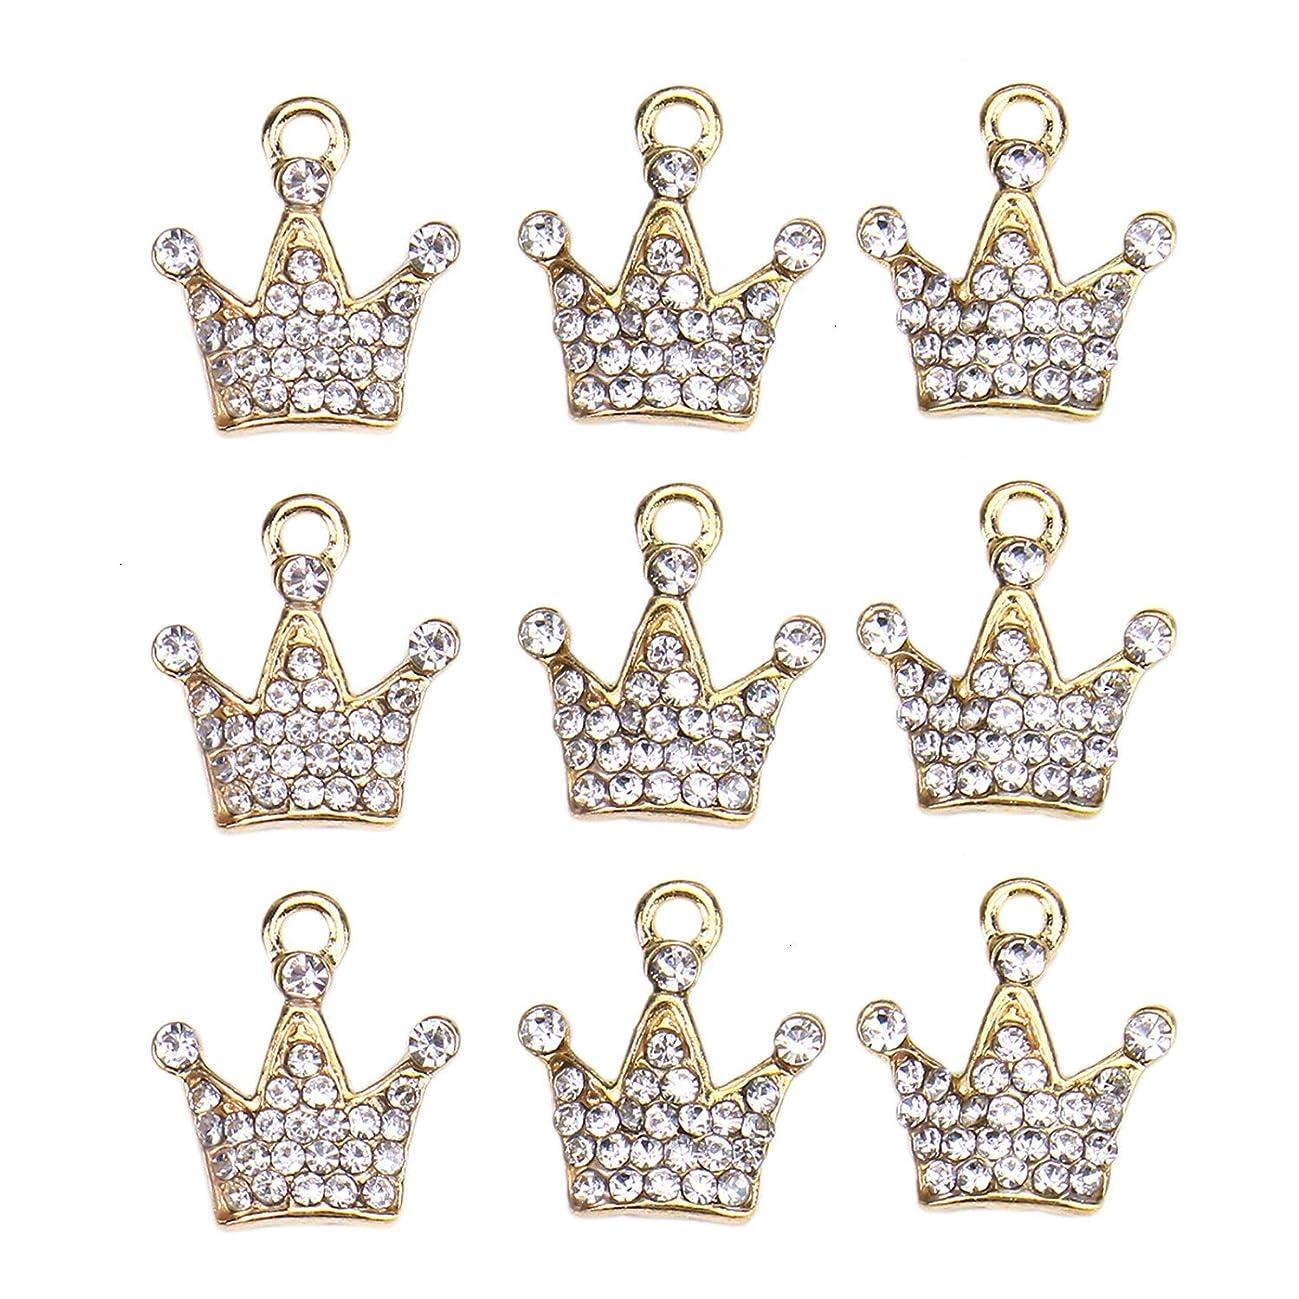 Monrocco 20 pcs Crown Charms Bulk Gold Crystal Flatback Buttons Embellishments